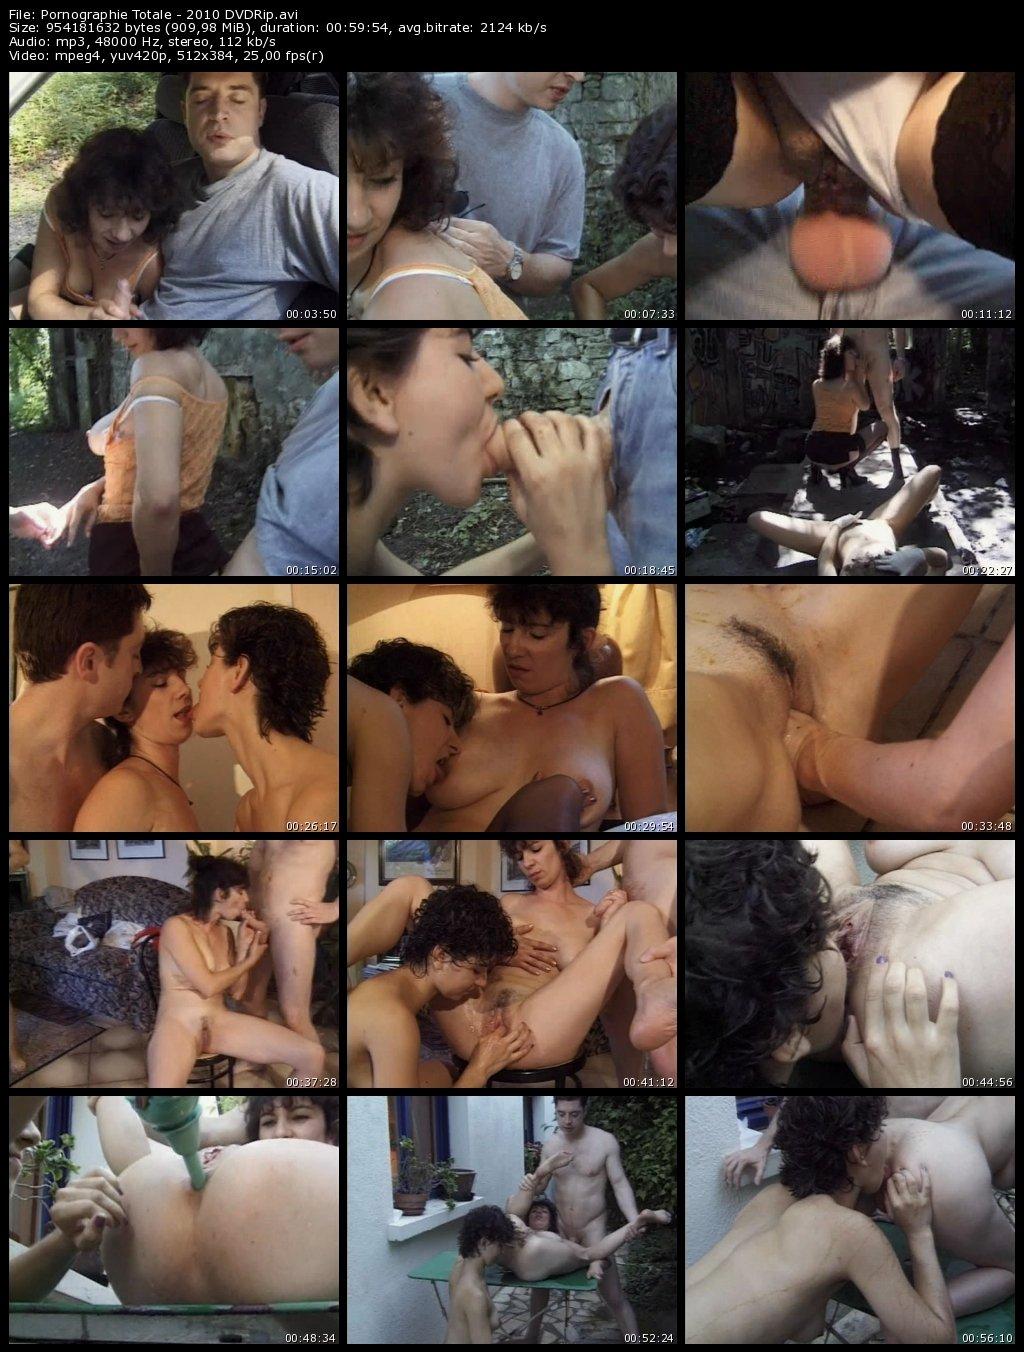 Pornographie Totale - 2010 DVDRip